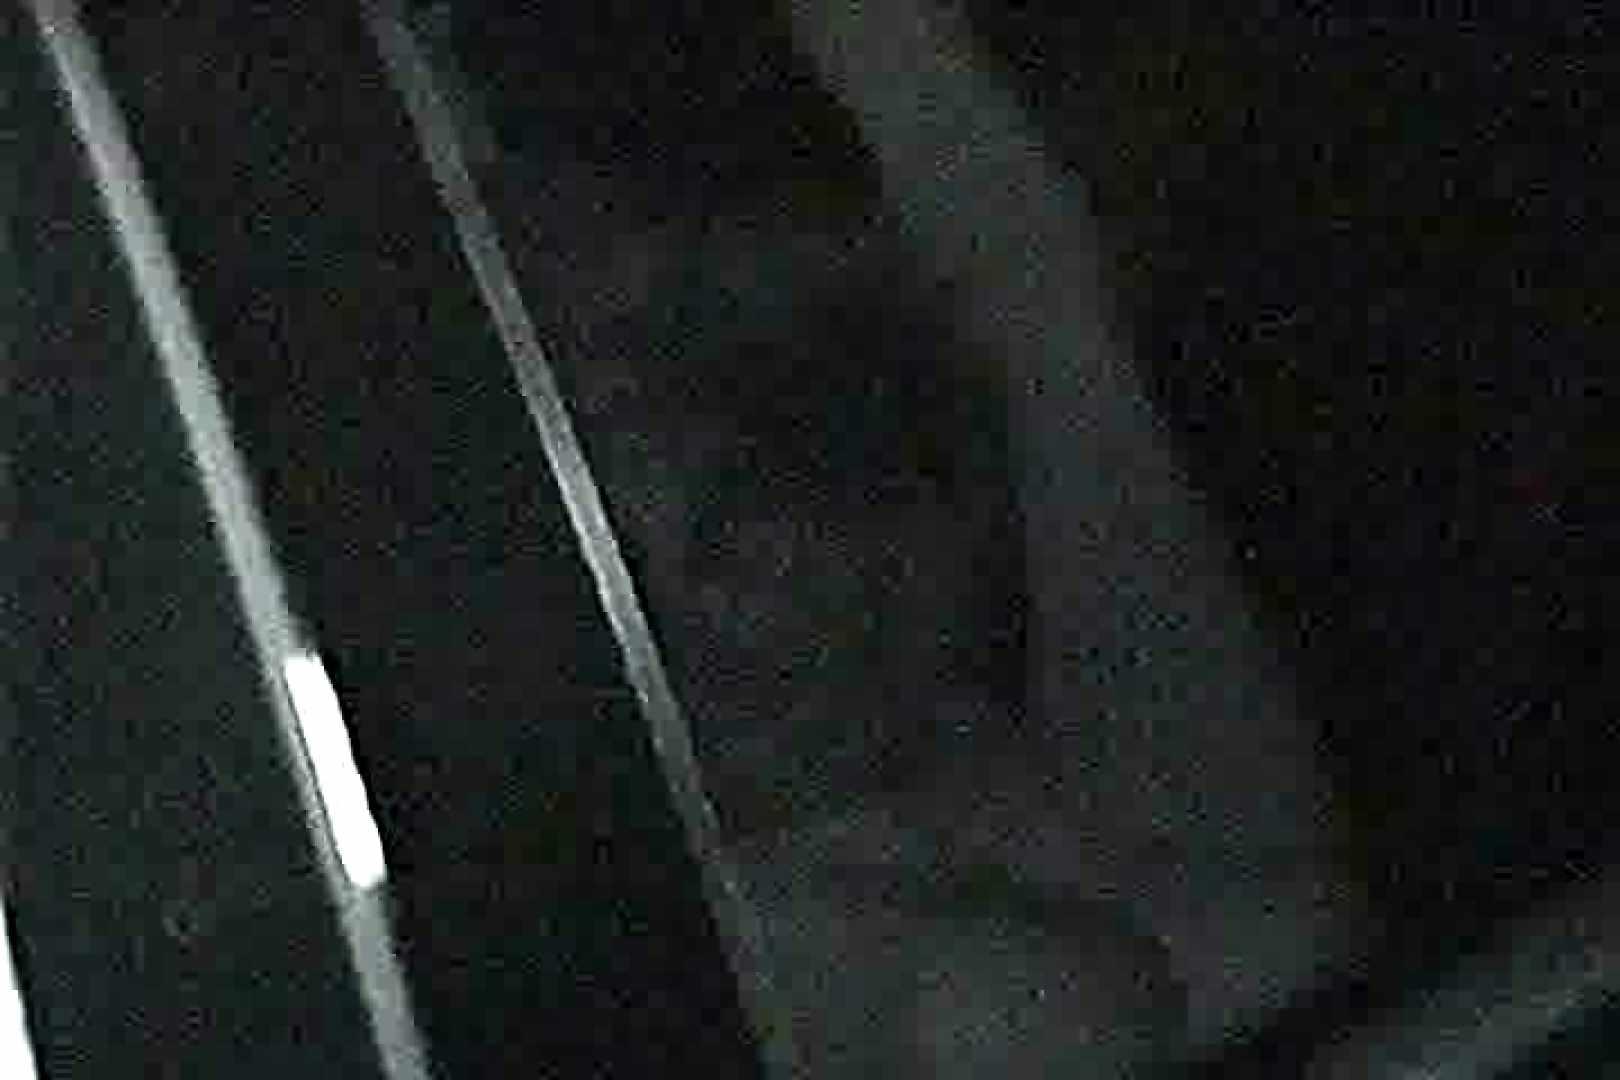 充血監督の深夜の運動会Vol.36 美女OL  23連発 22